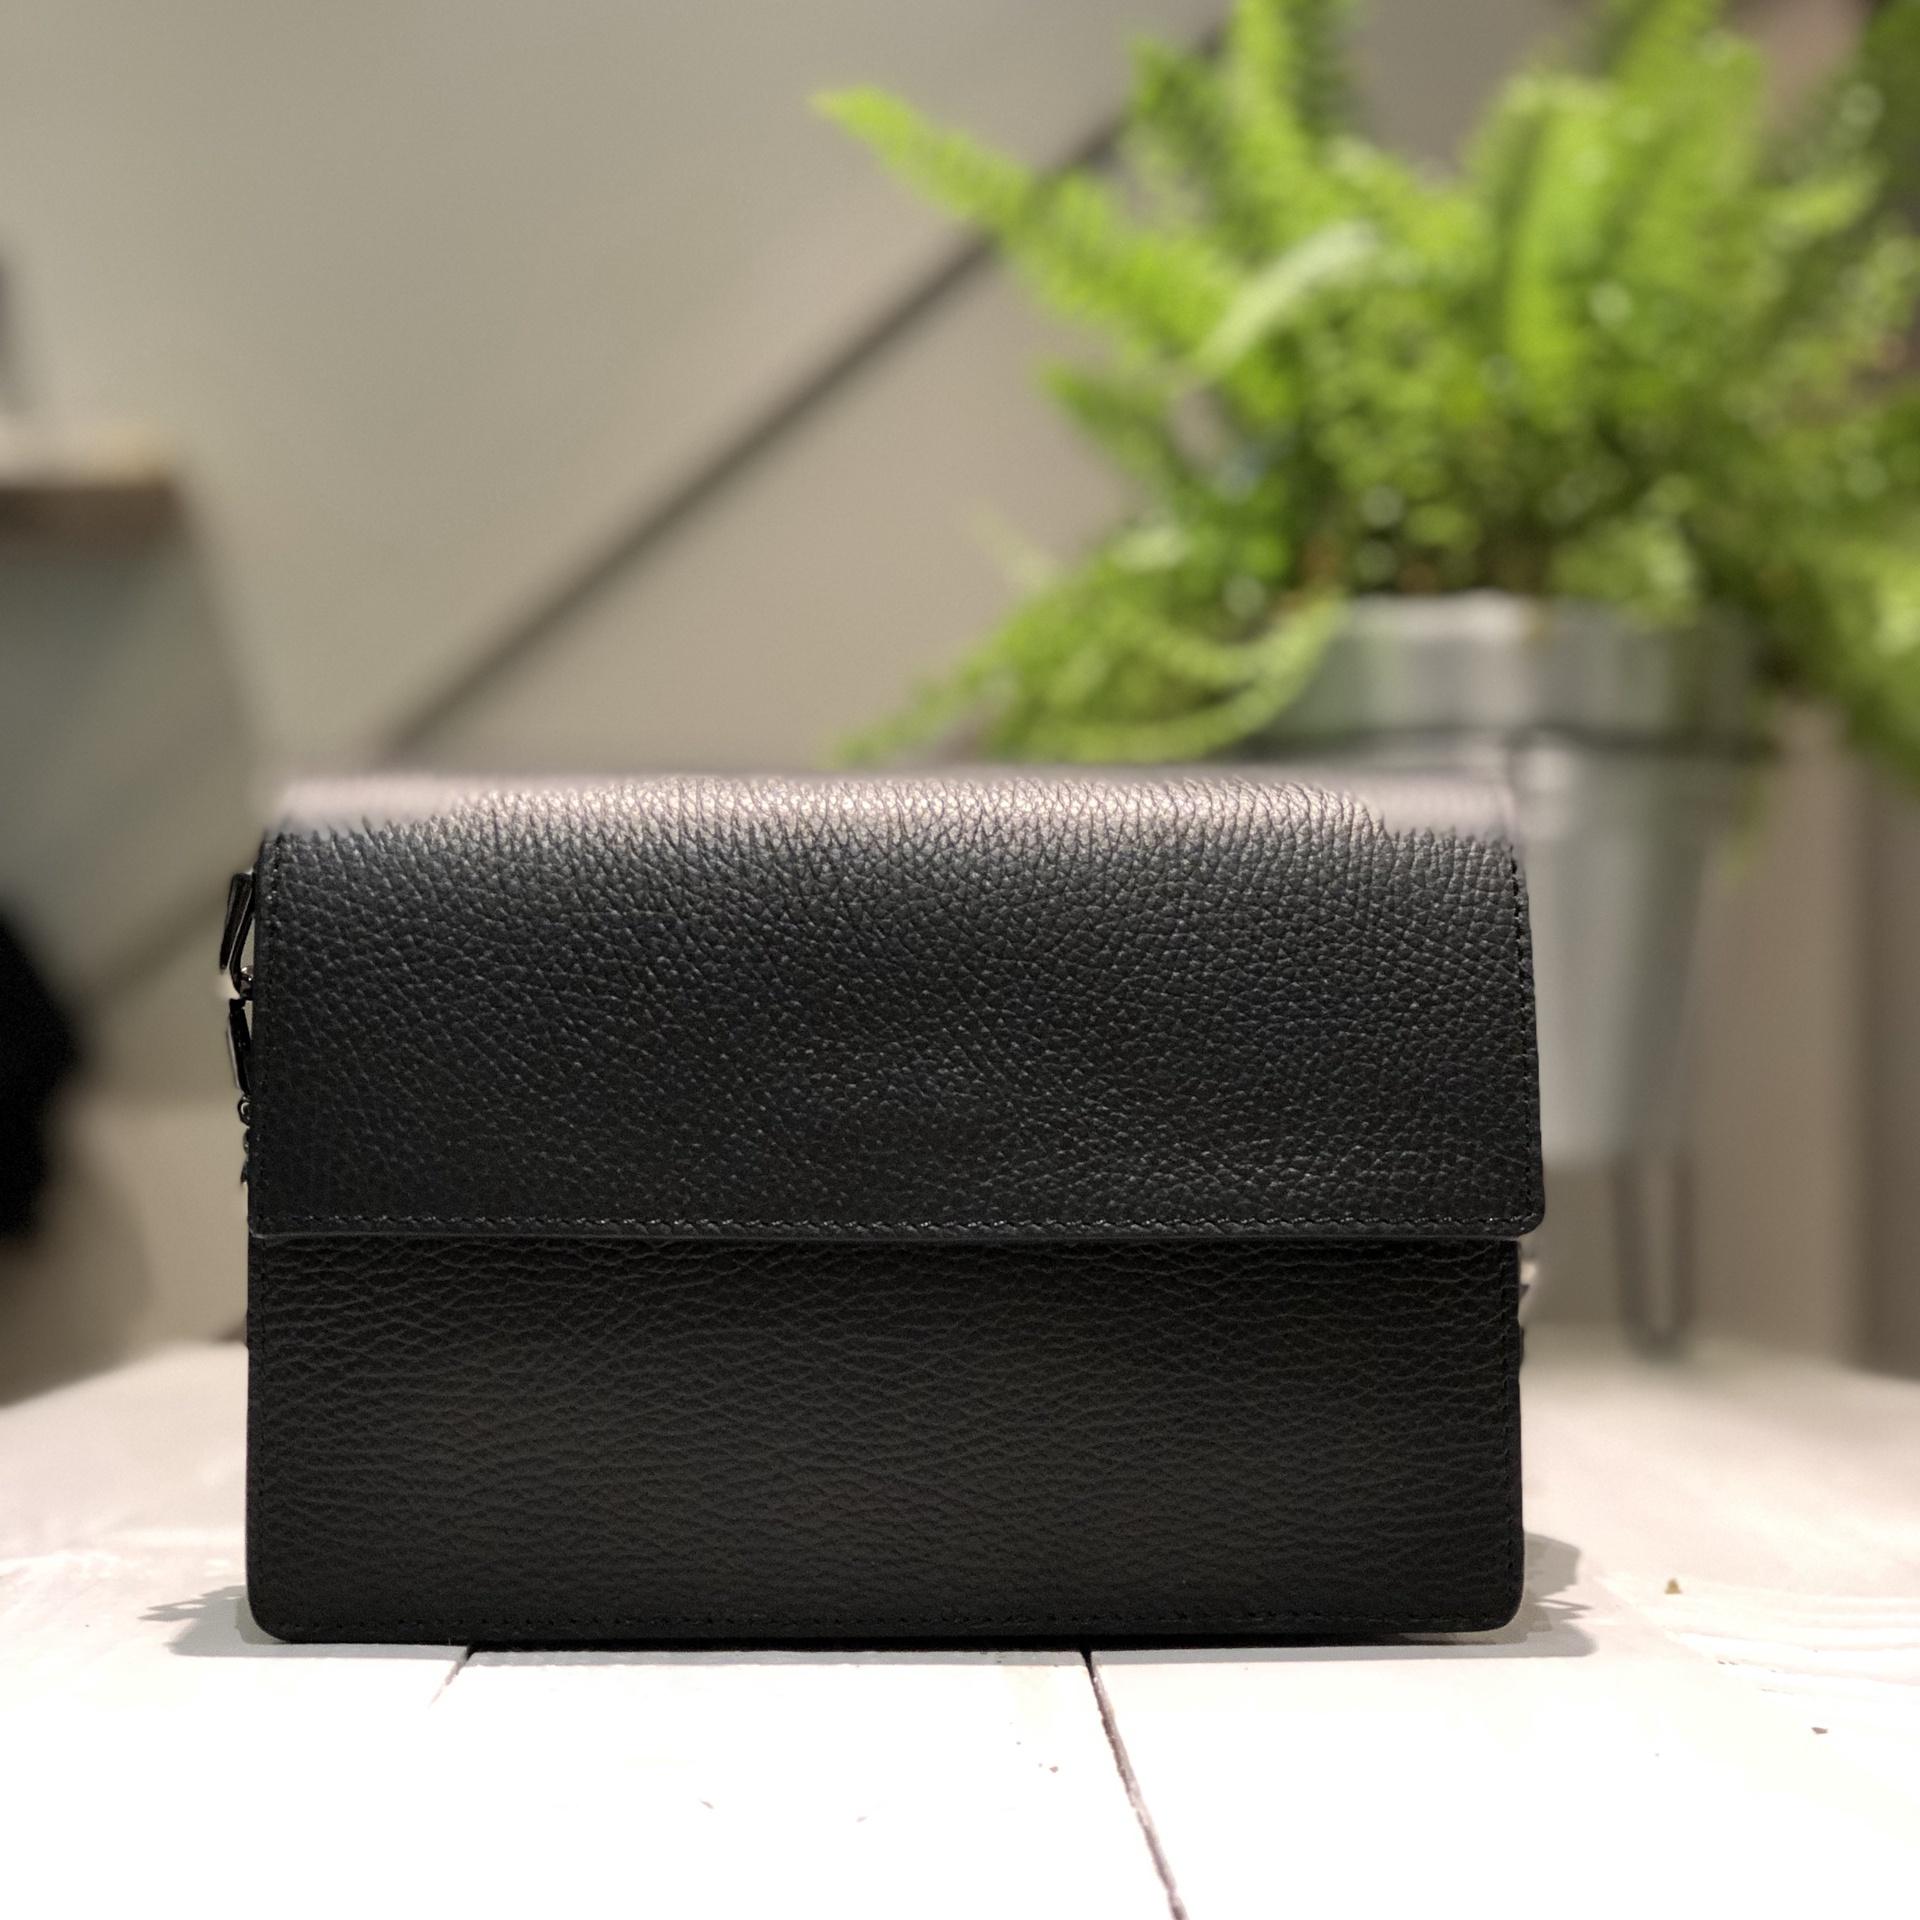 Iris Leather Bag - Black